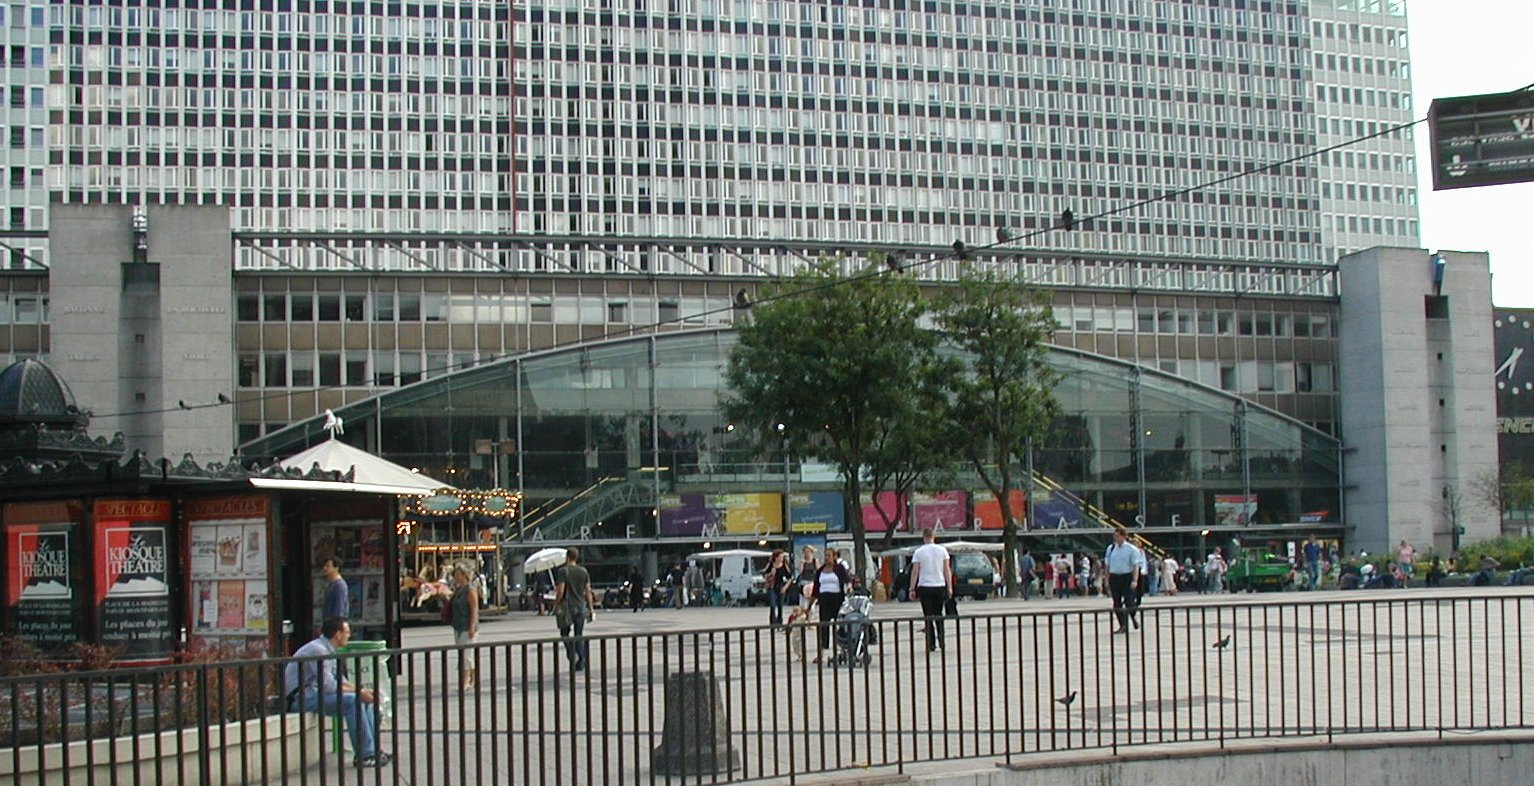 Gare montparnasse exterieur.jpg